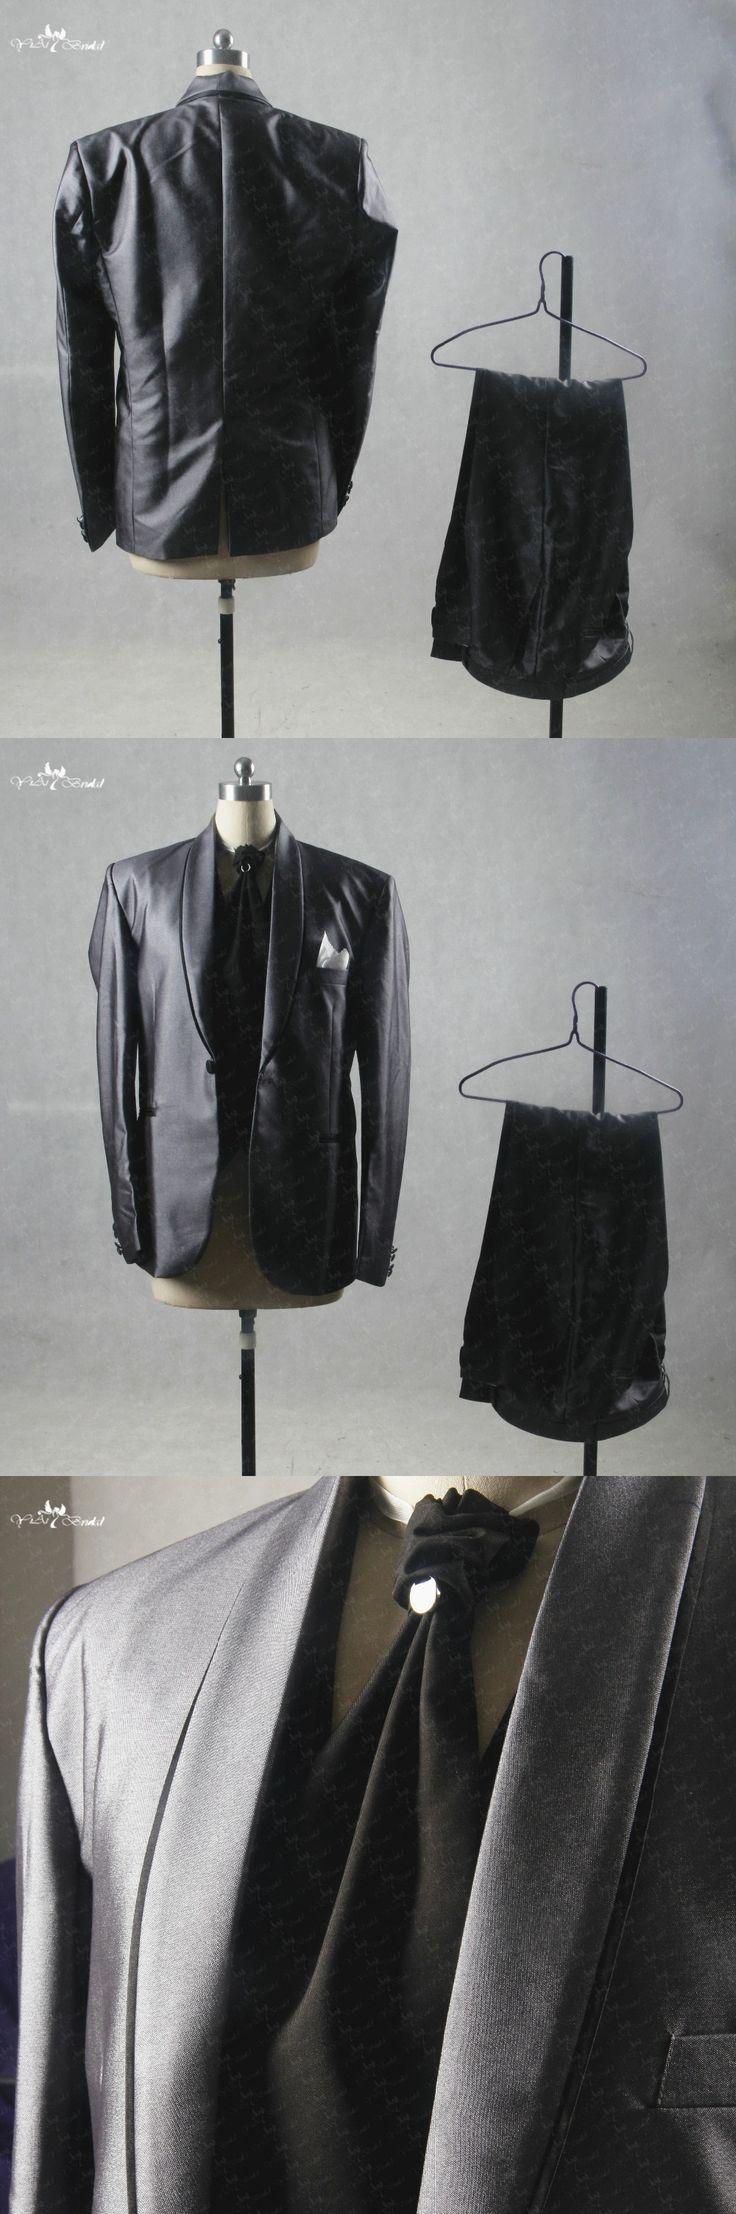 RSJ135 Italian Style Wedding Suit Men Grey Suit Black Tie